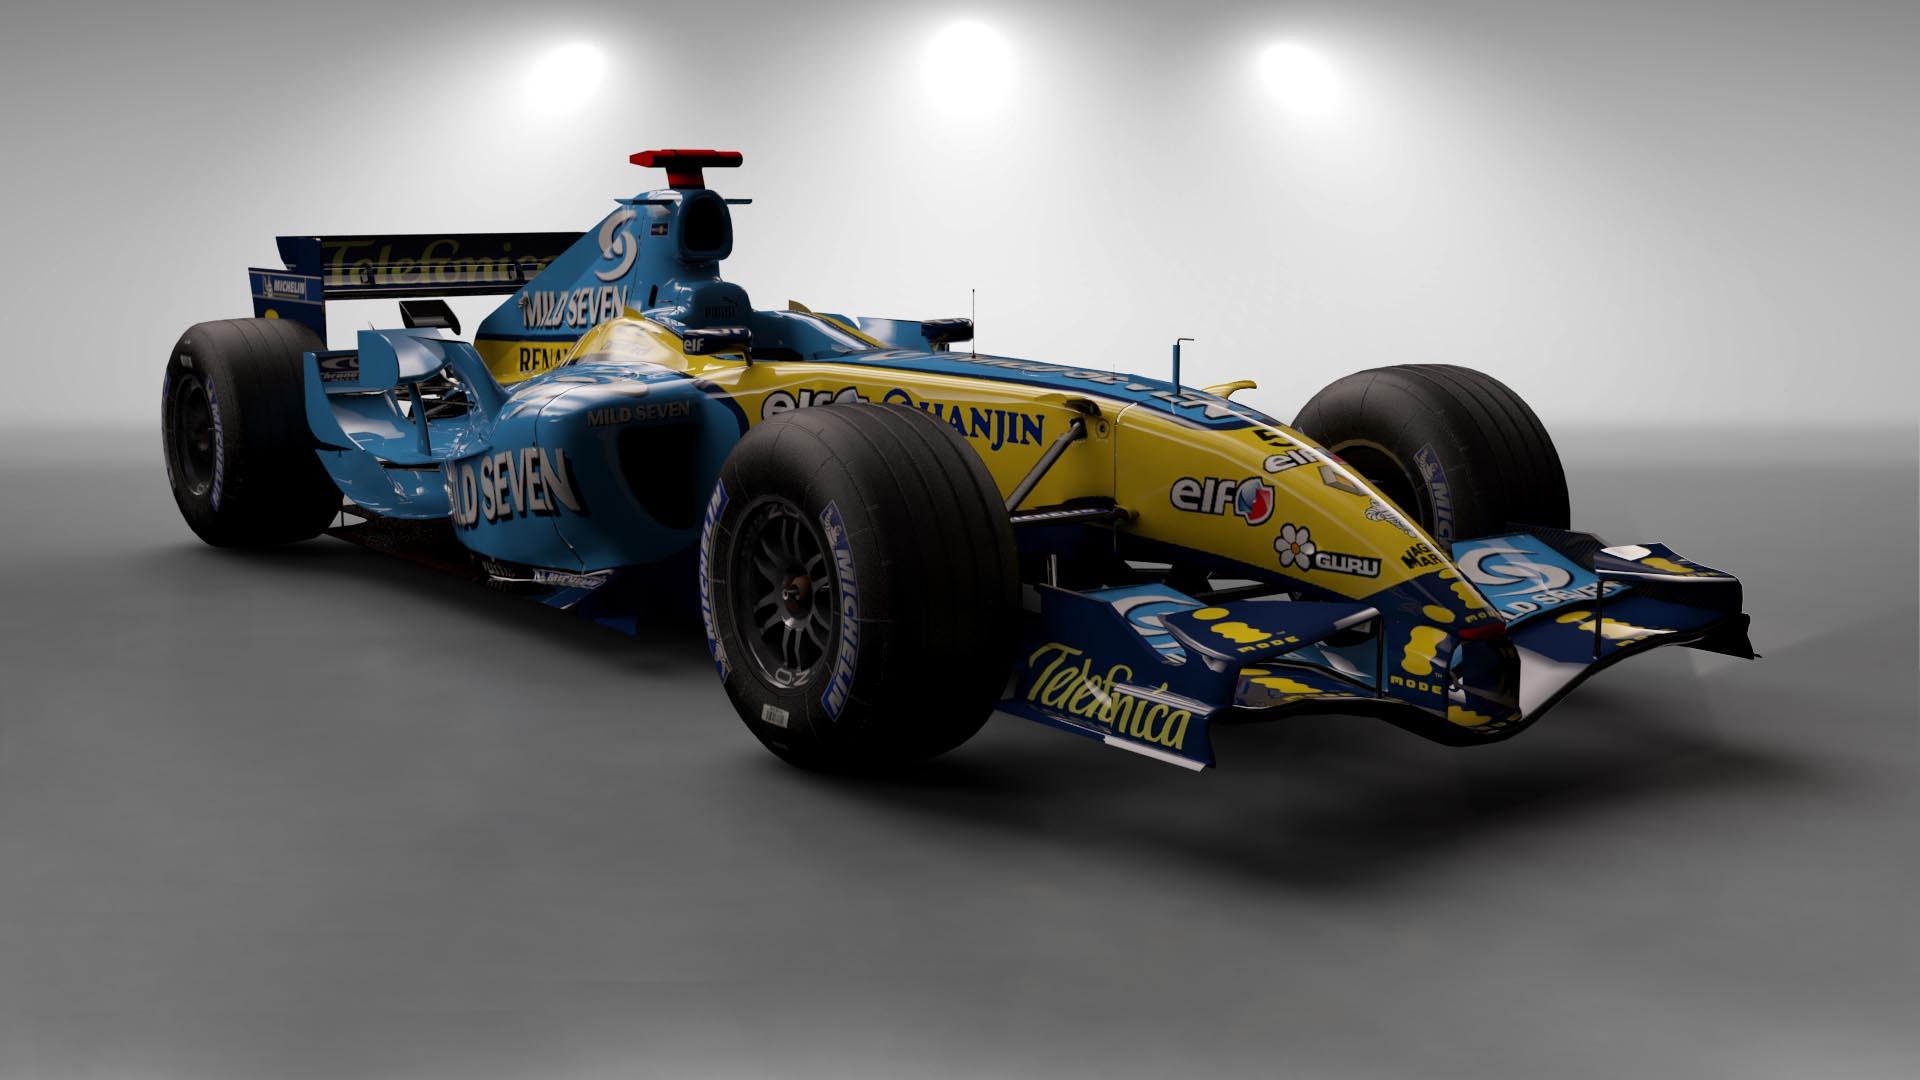 vrc 2005 renault r25 racedepartment